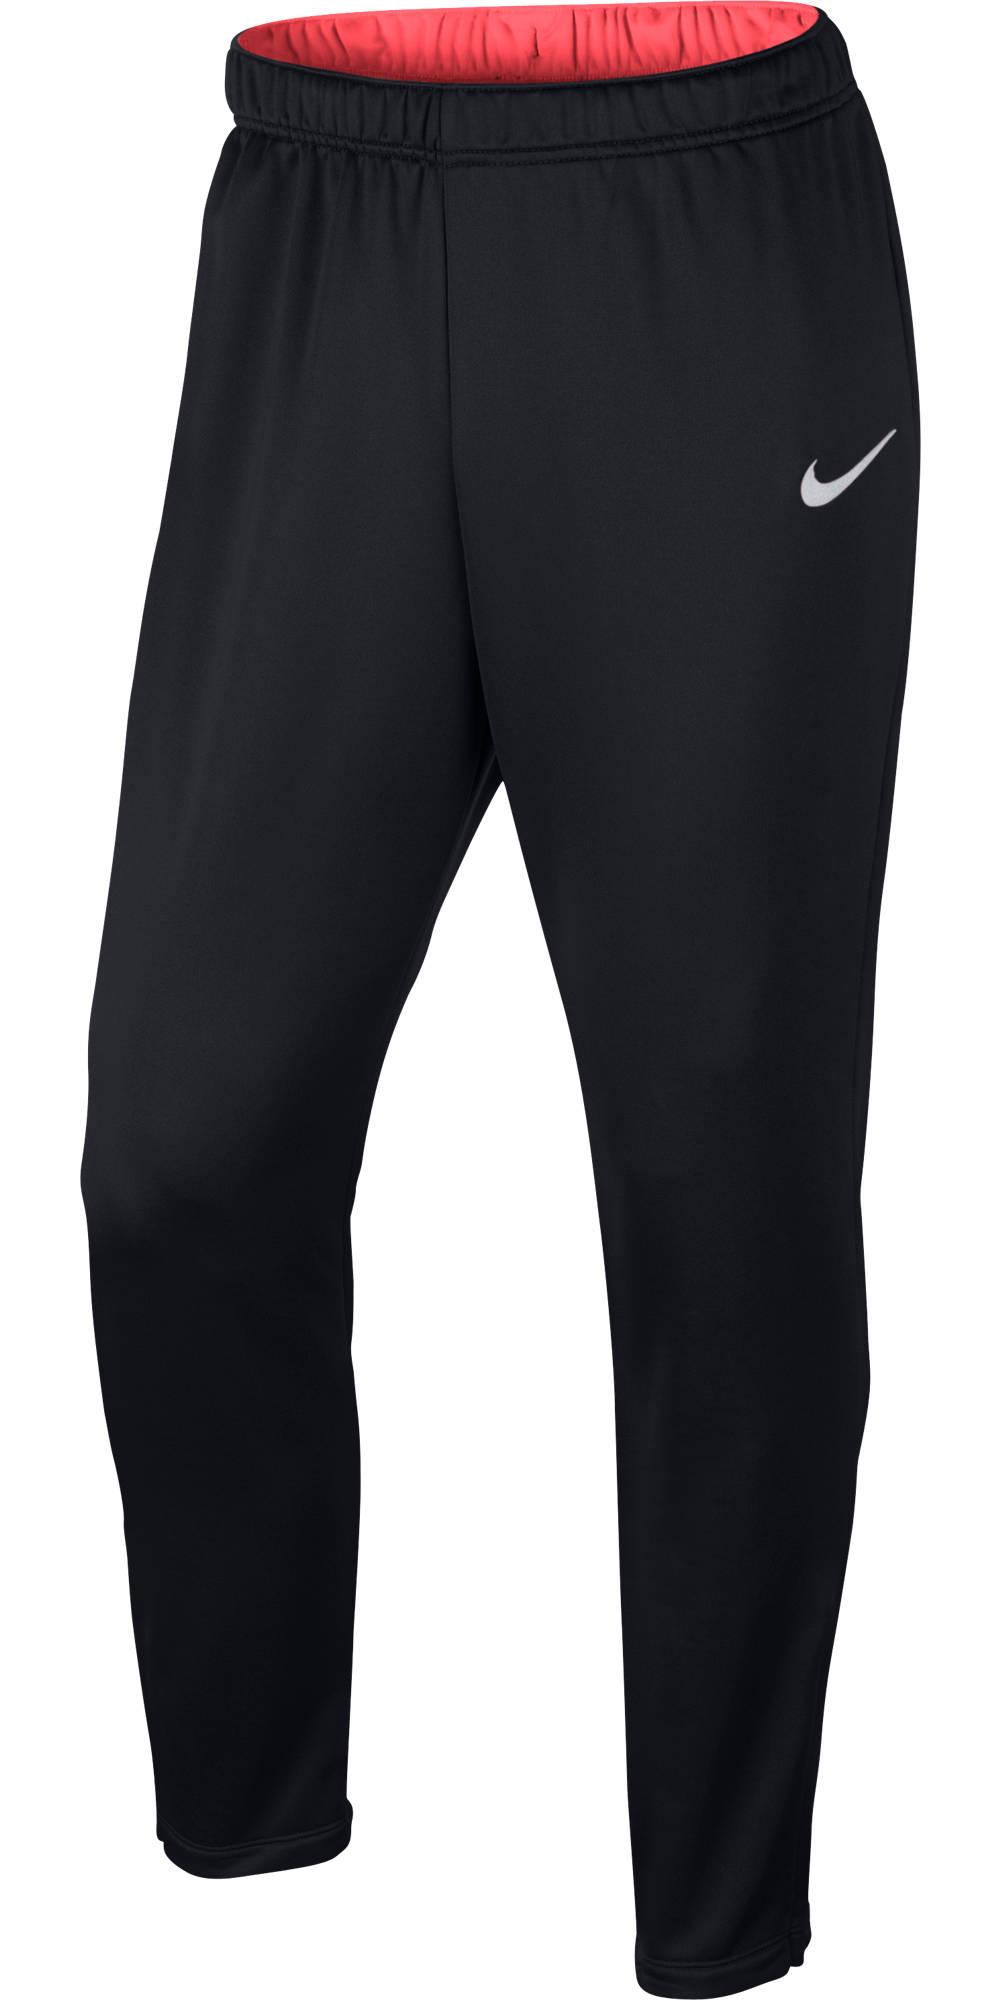 TECH ACADEMY KNIT Nike Track Pants Hose 2015 Herren ...